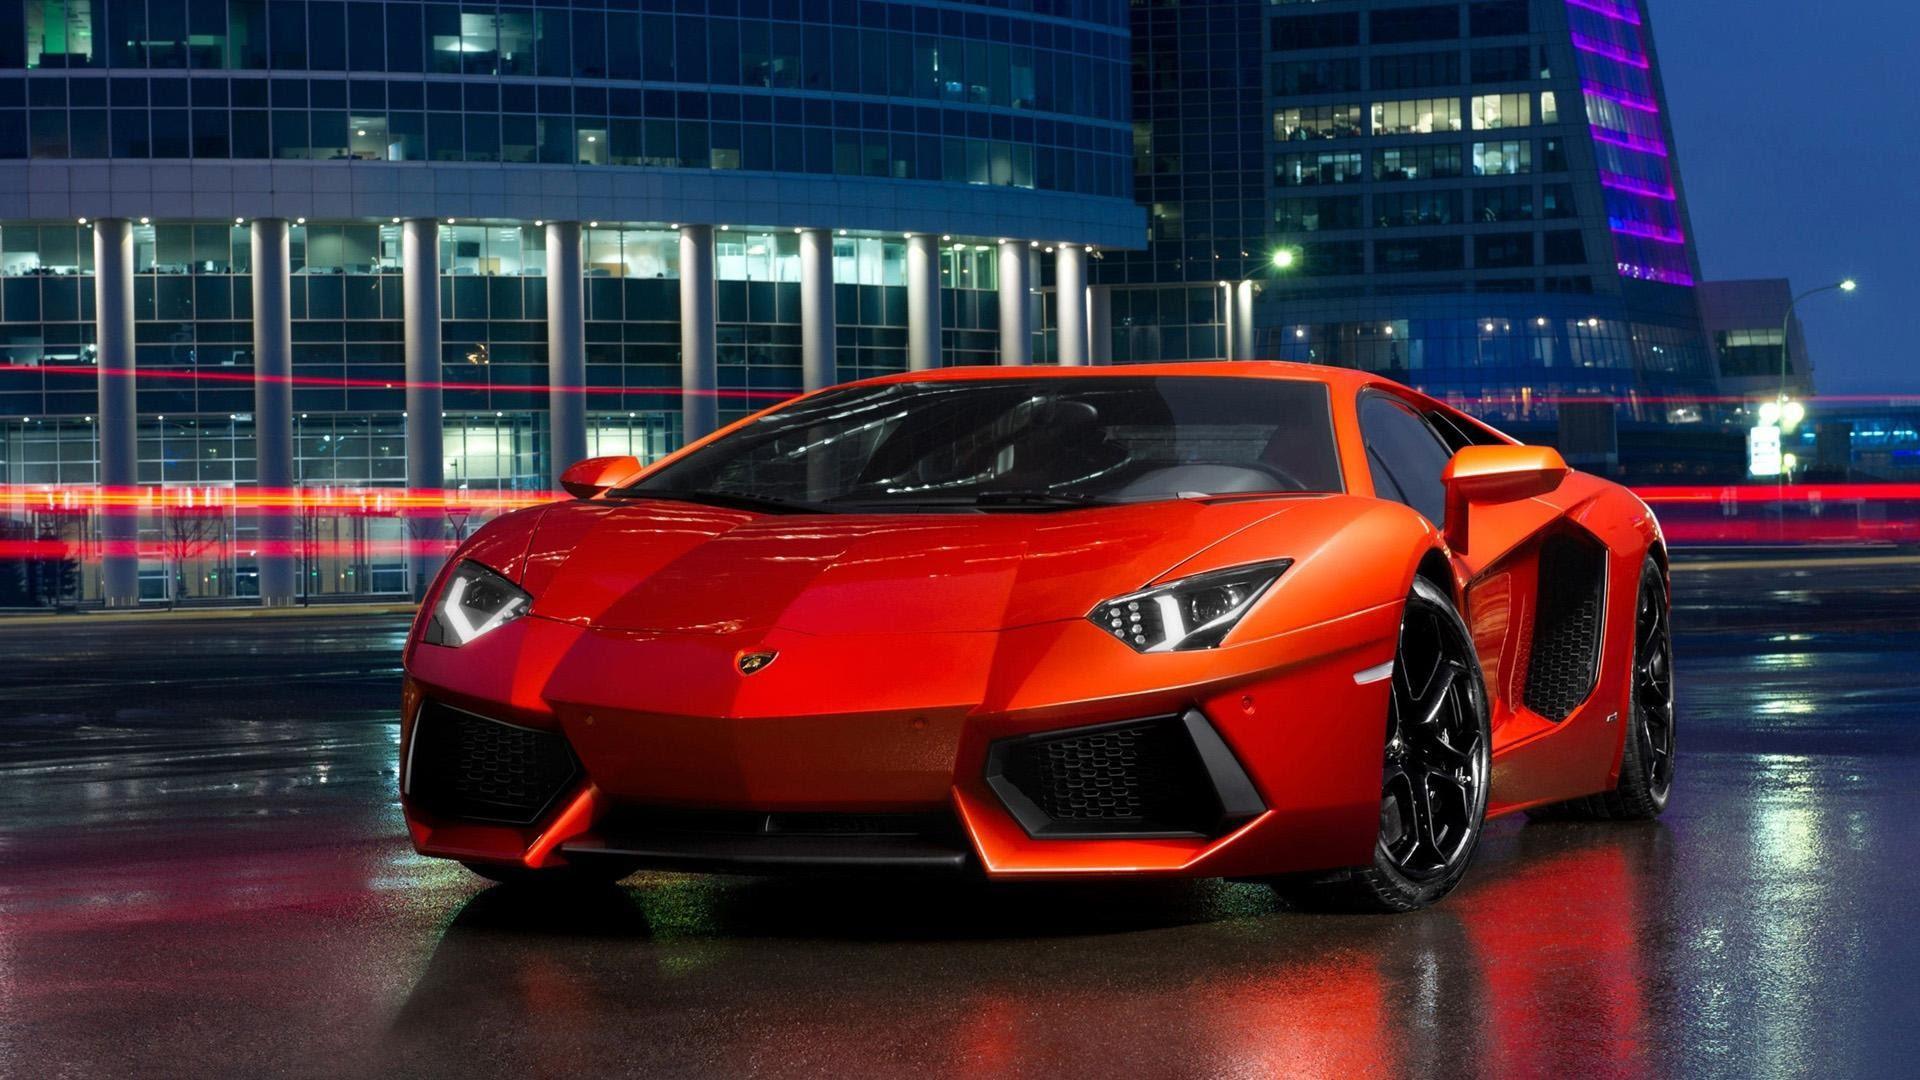 Cars Wallpapers Hd Ferrari Cool Sport Cars